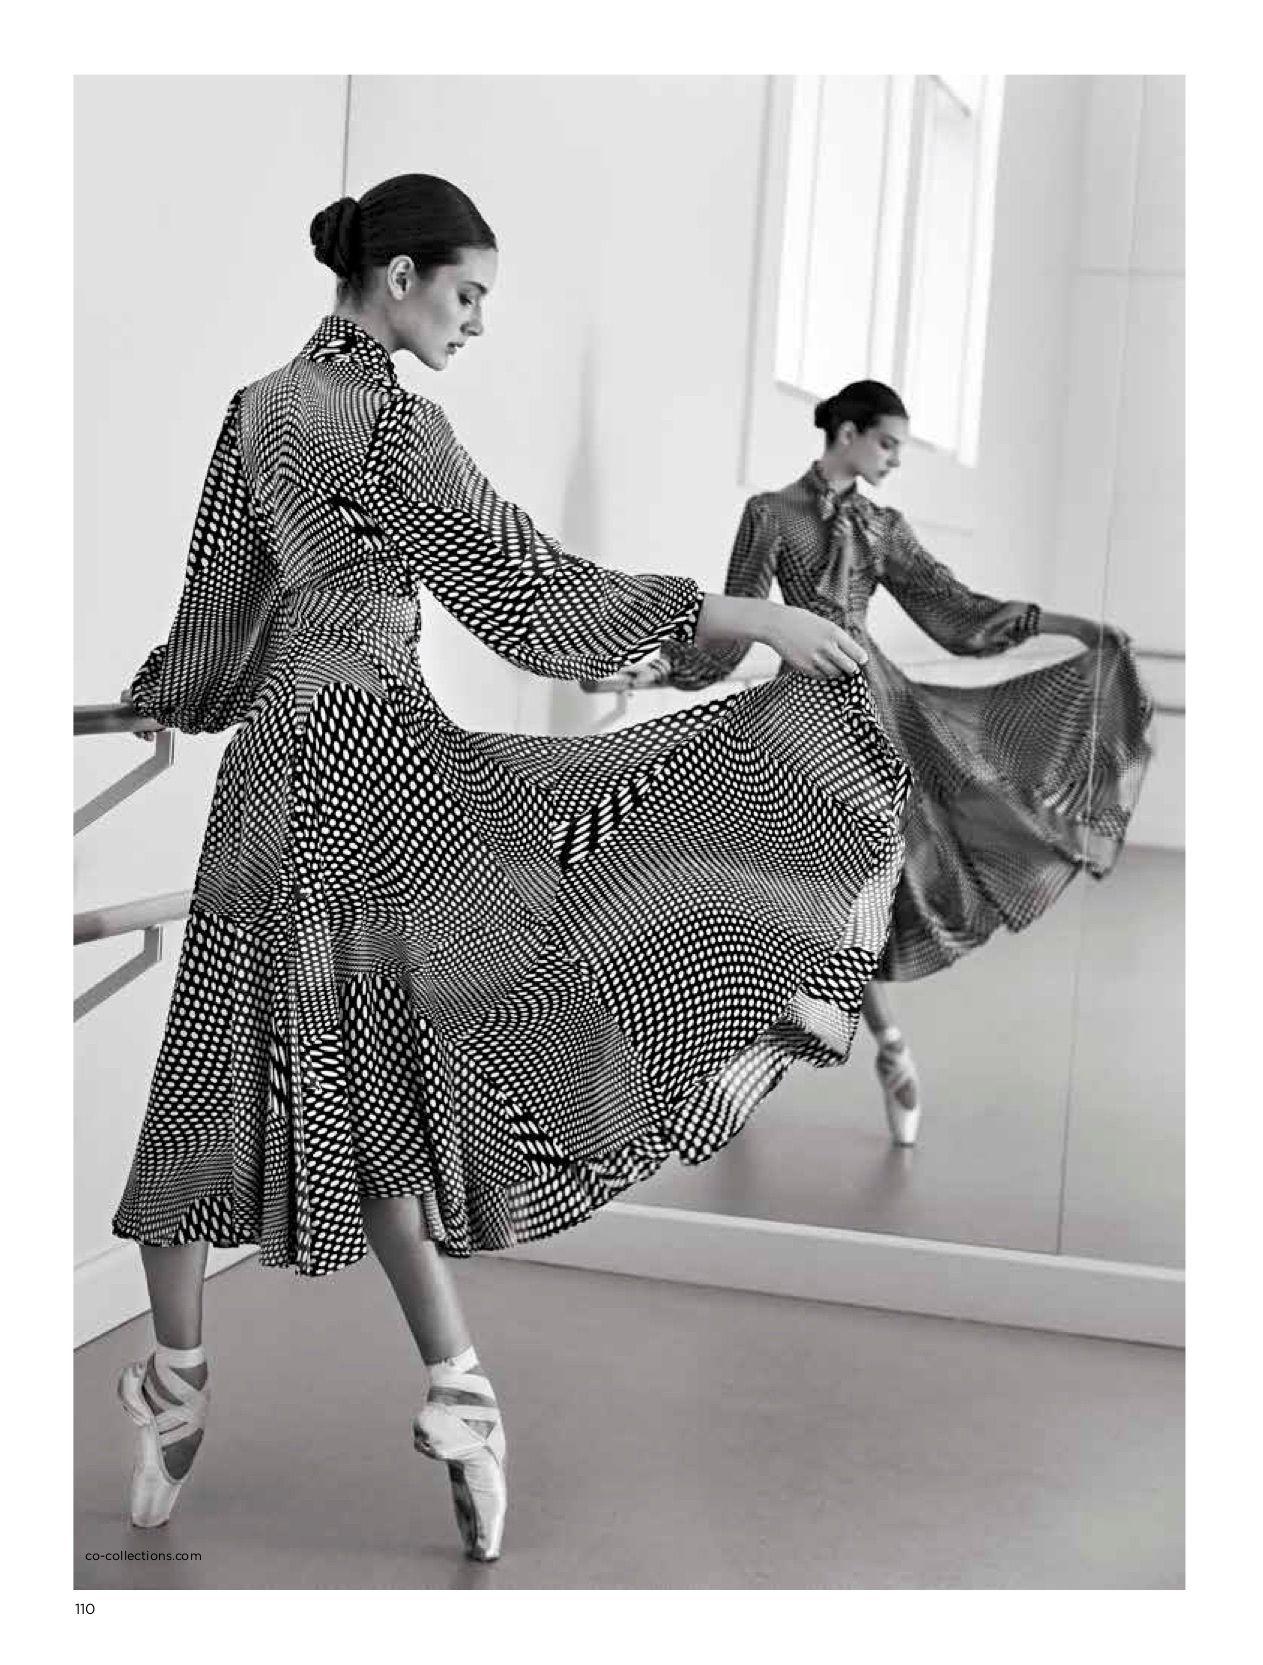 The Wonderful World of Dance Magazine Act III (PRINT) | 17